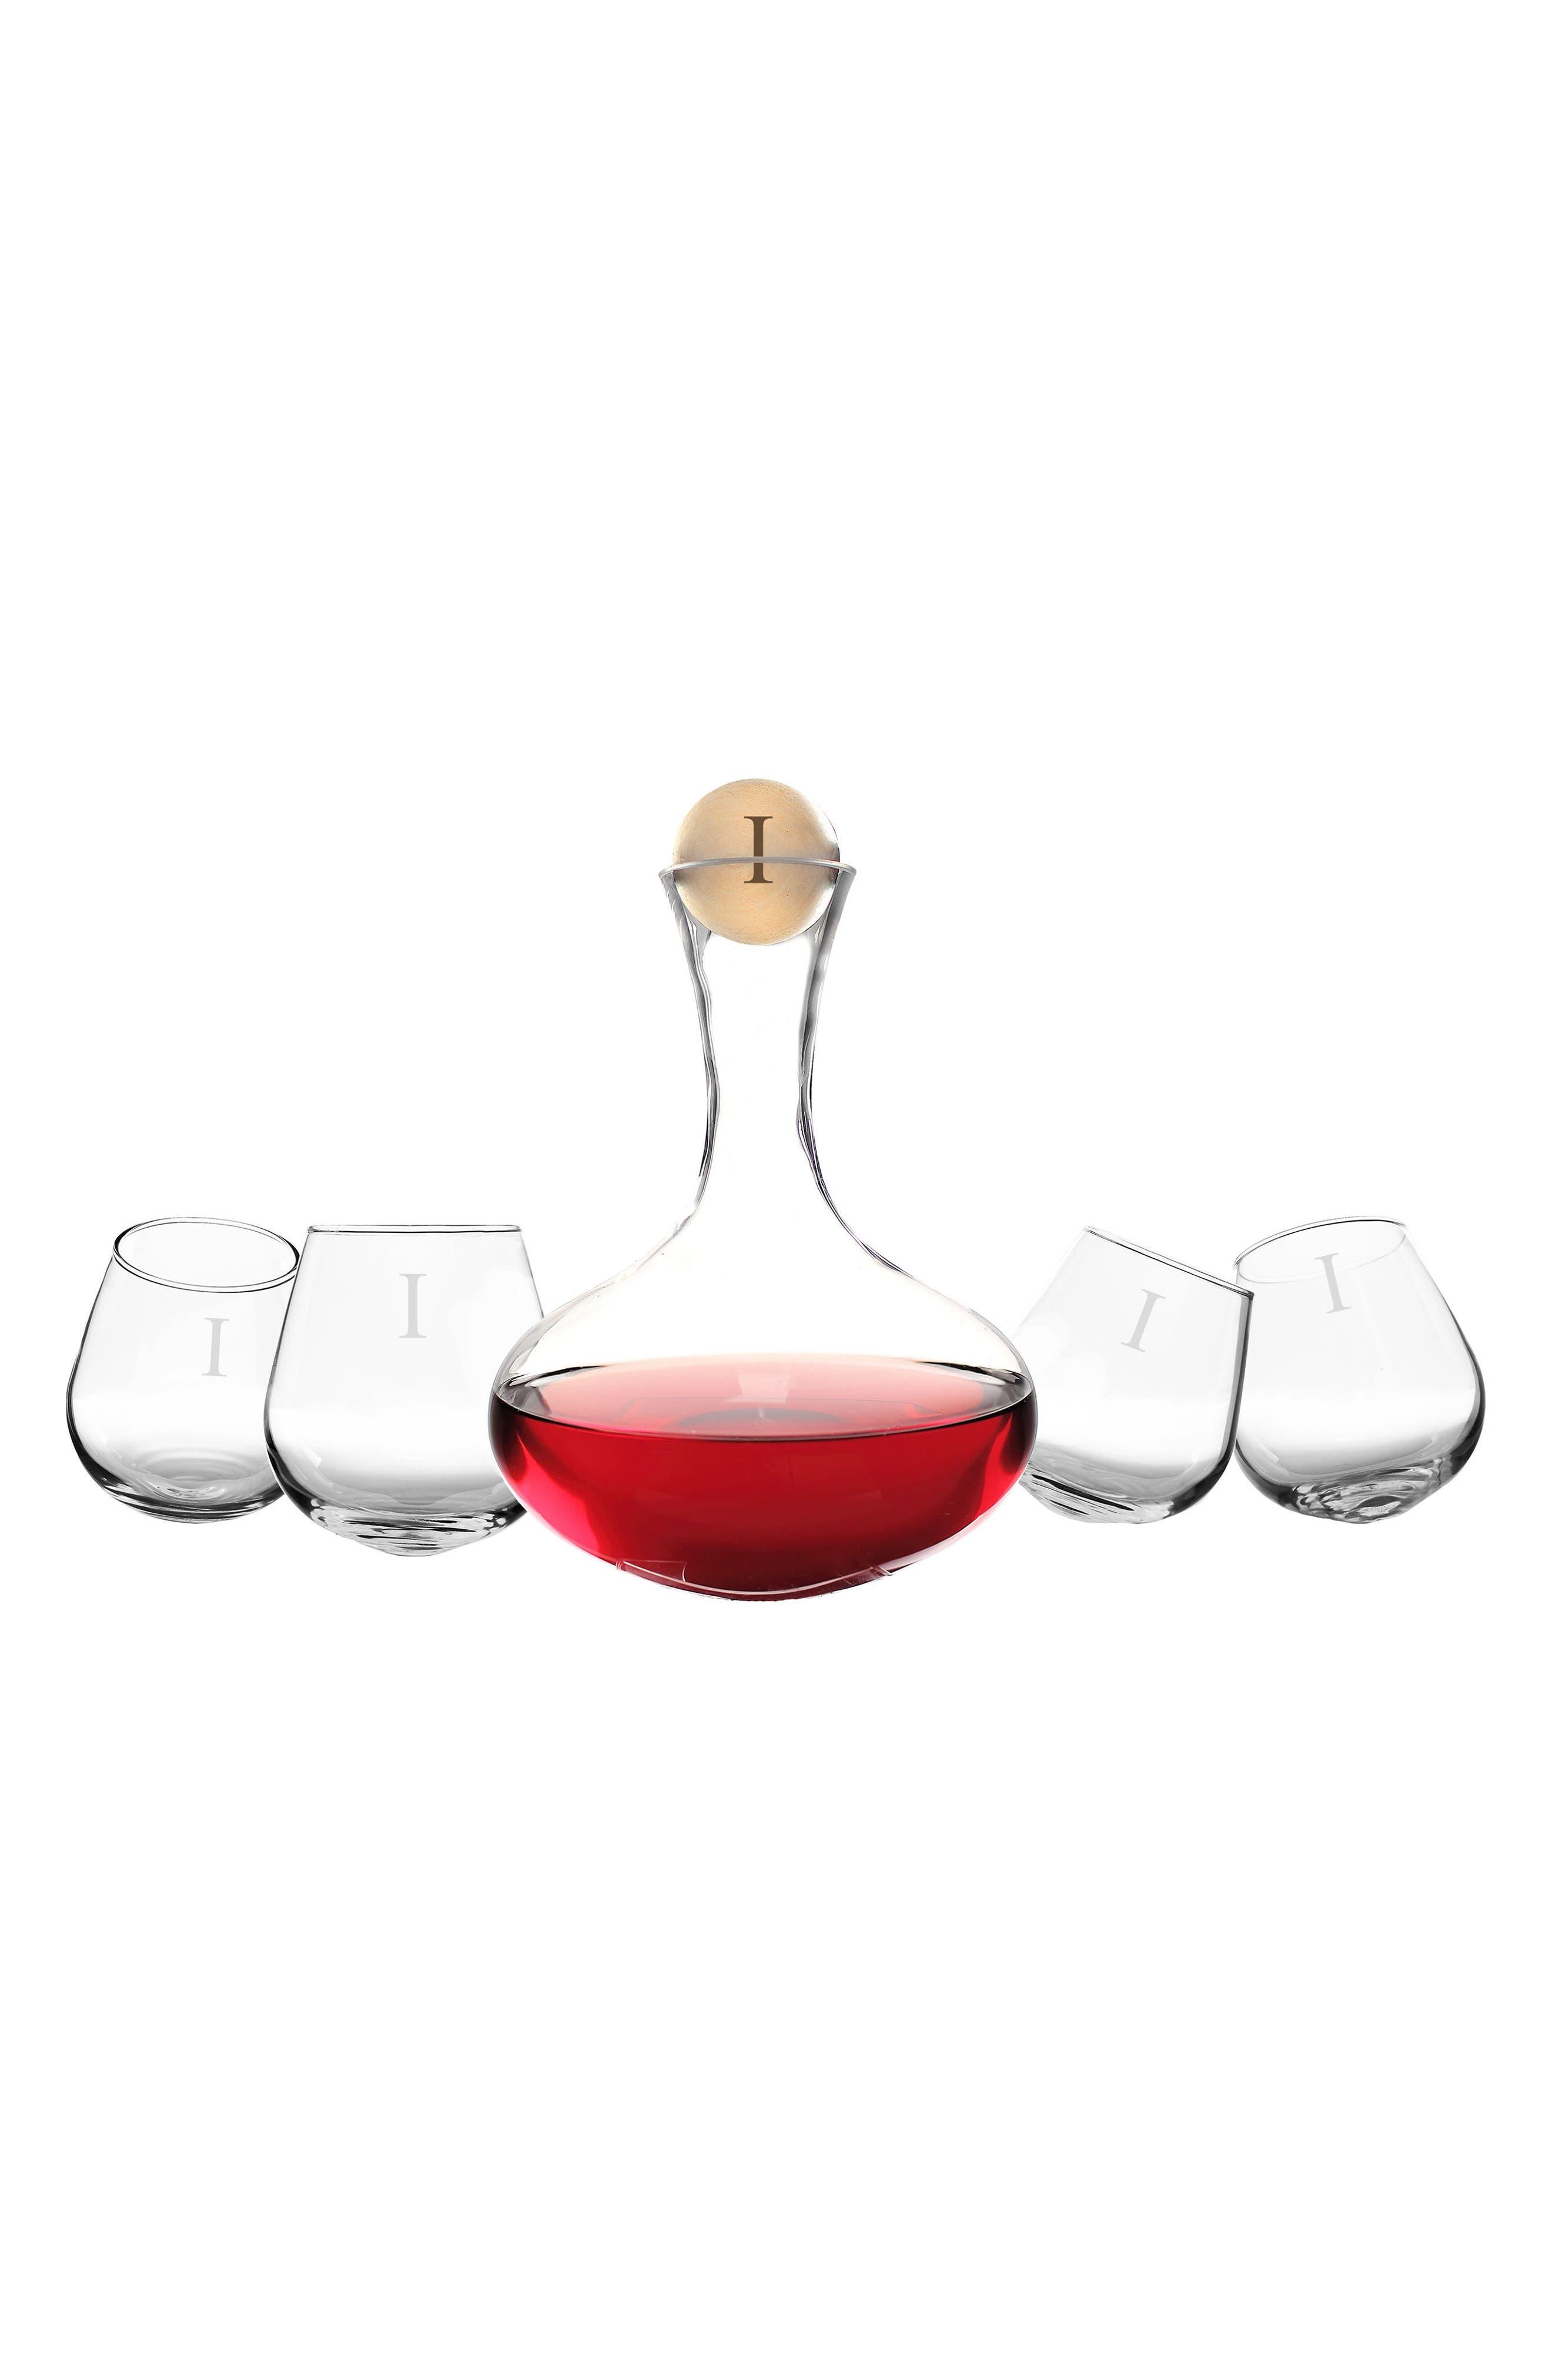 'Tipsy' Monogram Wine Decanter & Stemless Glasses,                         Main,                         color, I